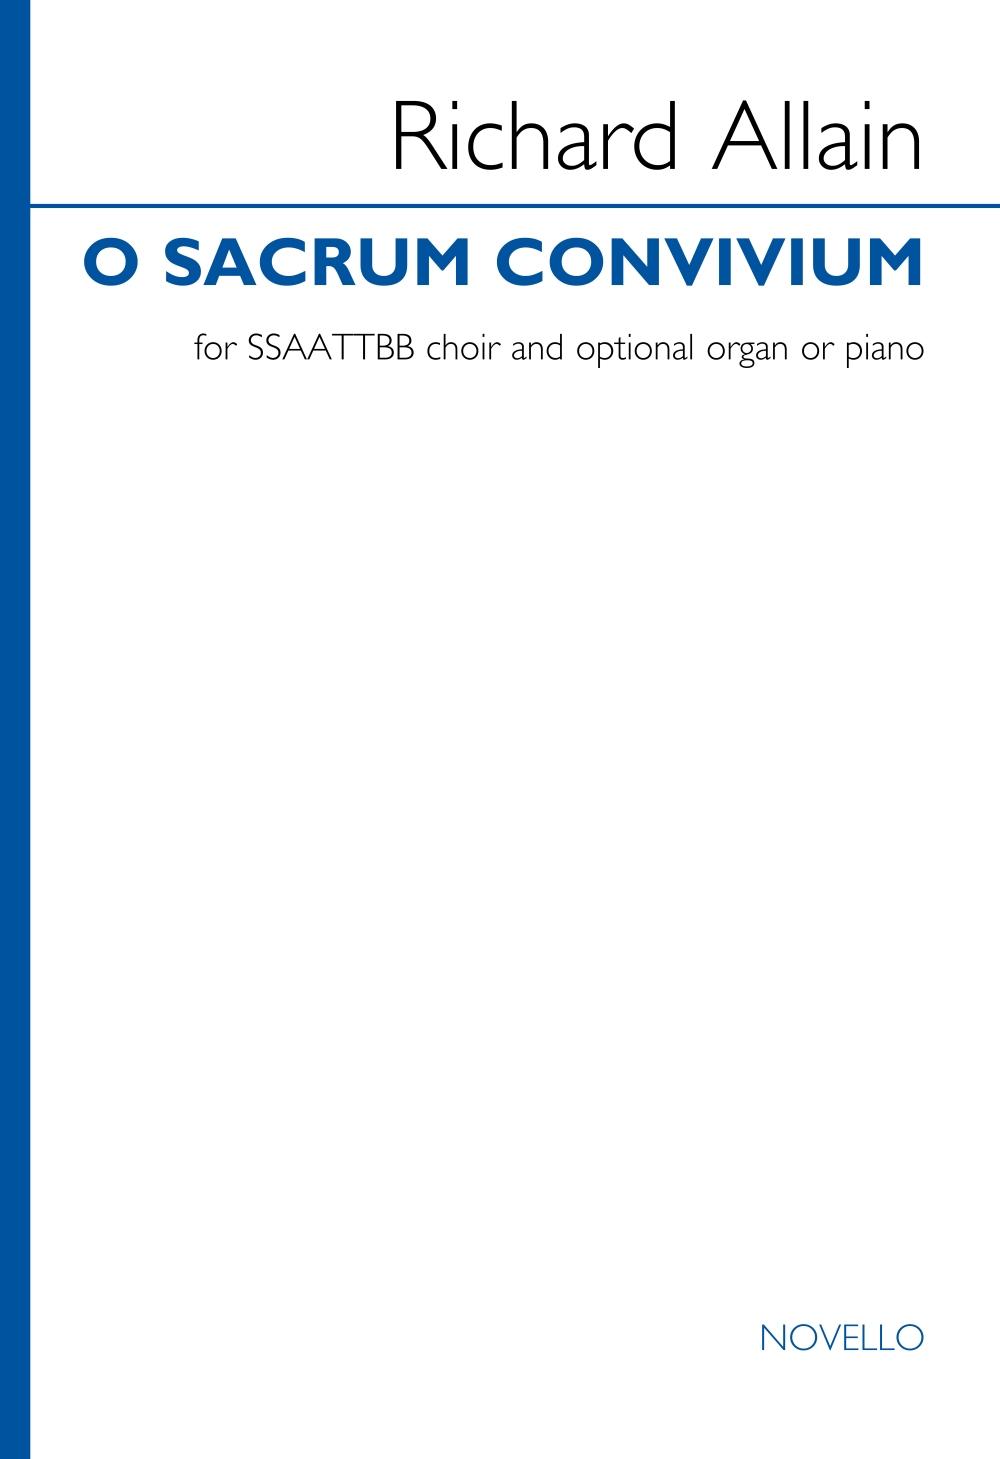 Richard Allain: O sacrum convivium: Mixed Choir and Piano/Organ: Vocal Score